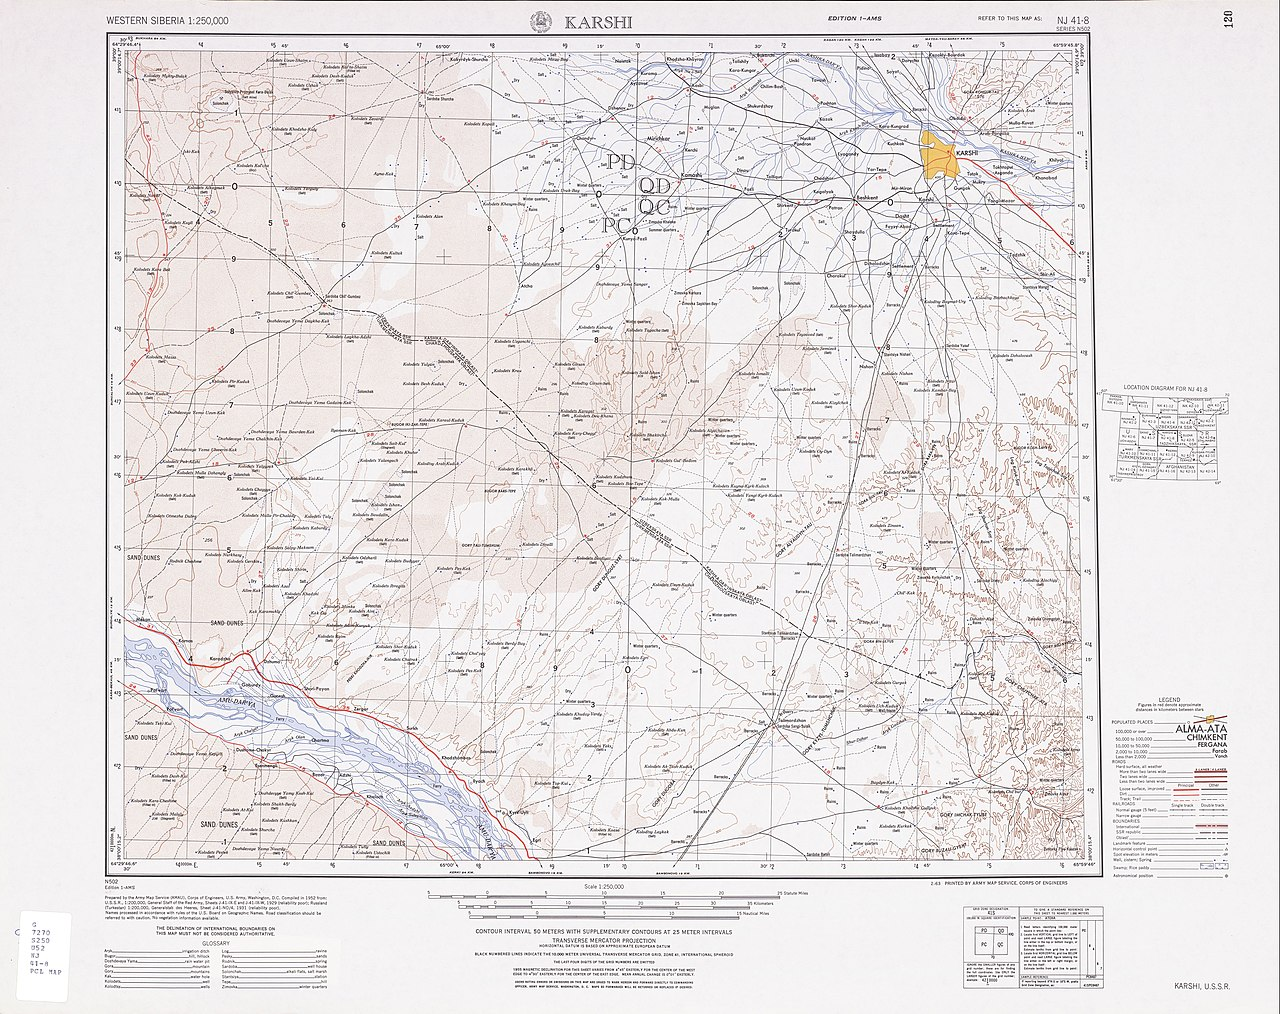 FileUSSR map NJ 418 Karshijpg Wikimedia Commons